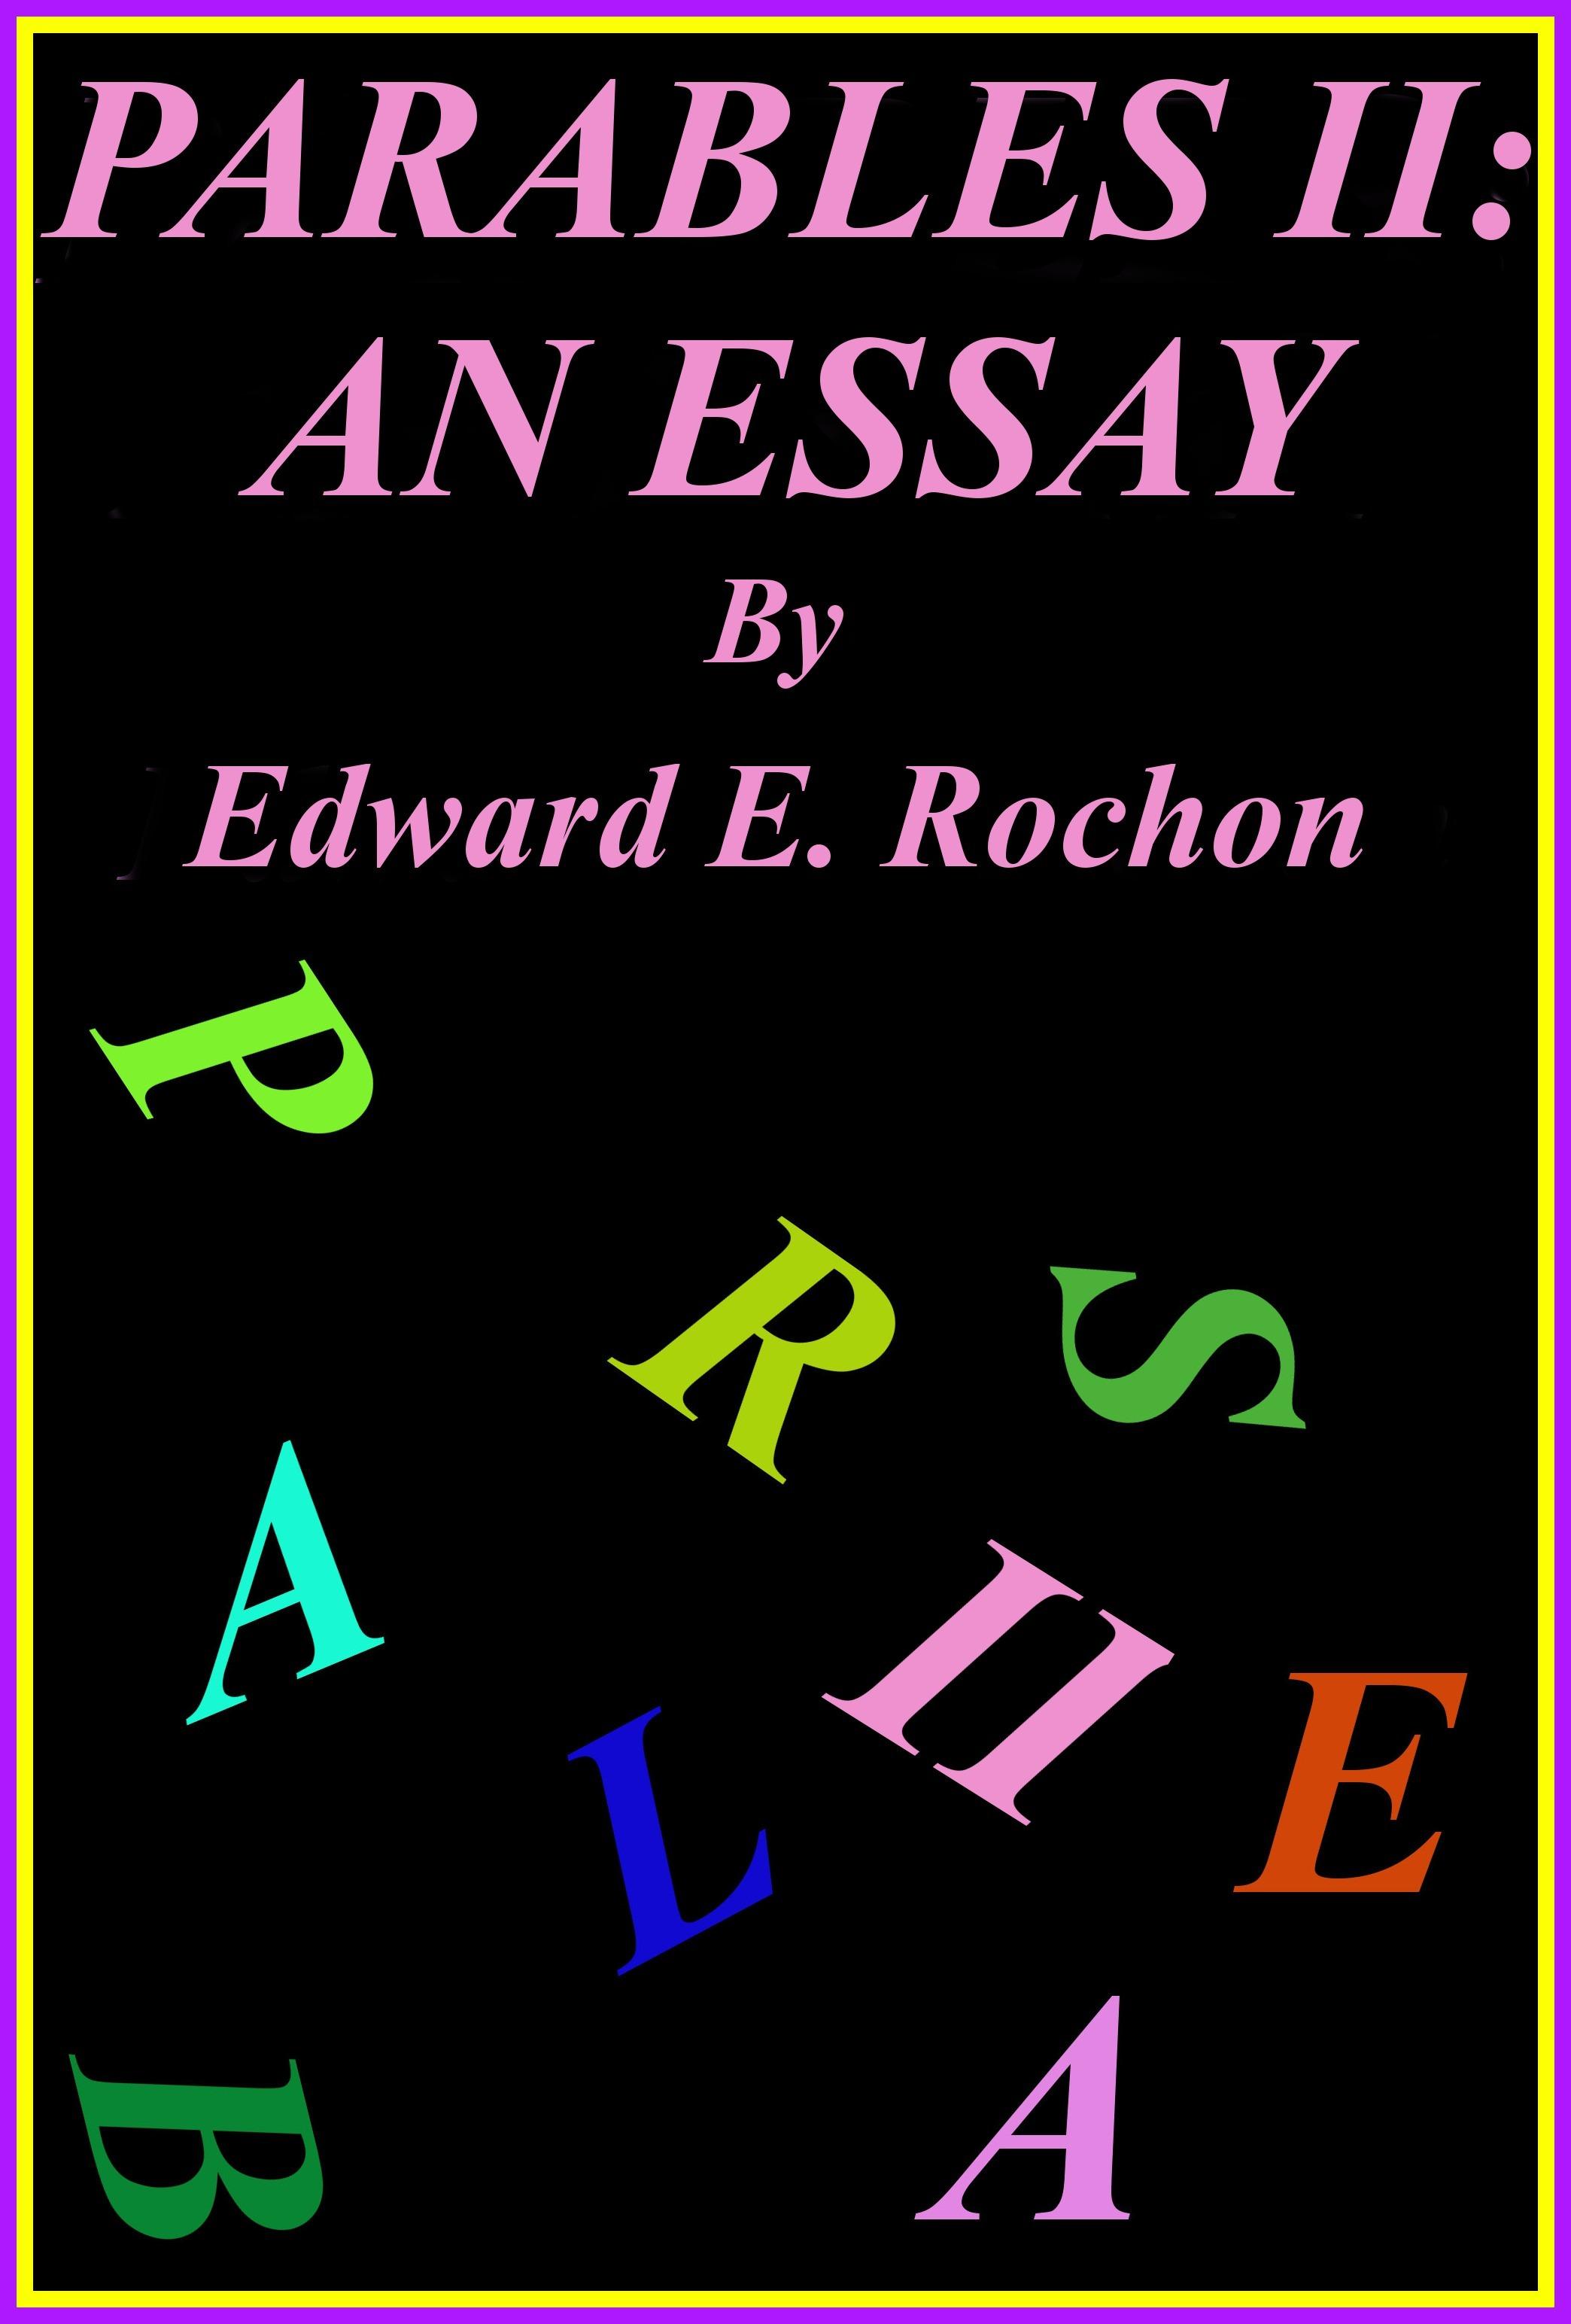 Parables II: An Essay Edward E. Rochon